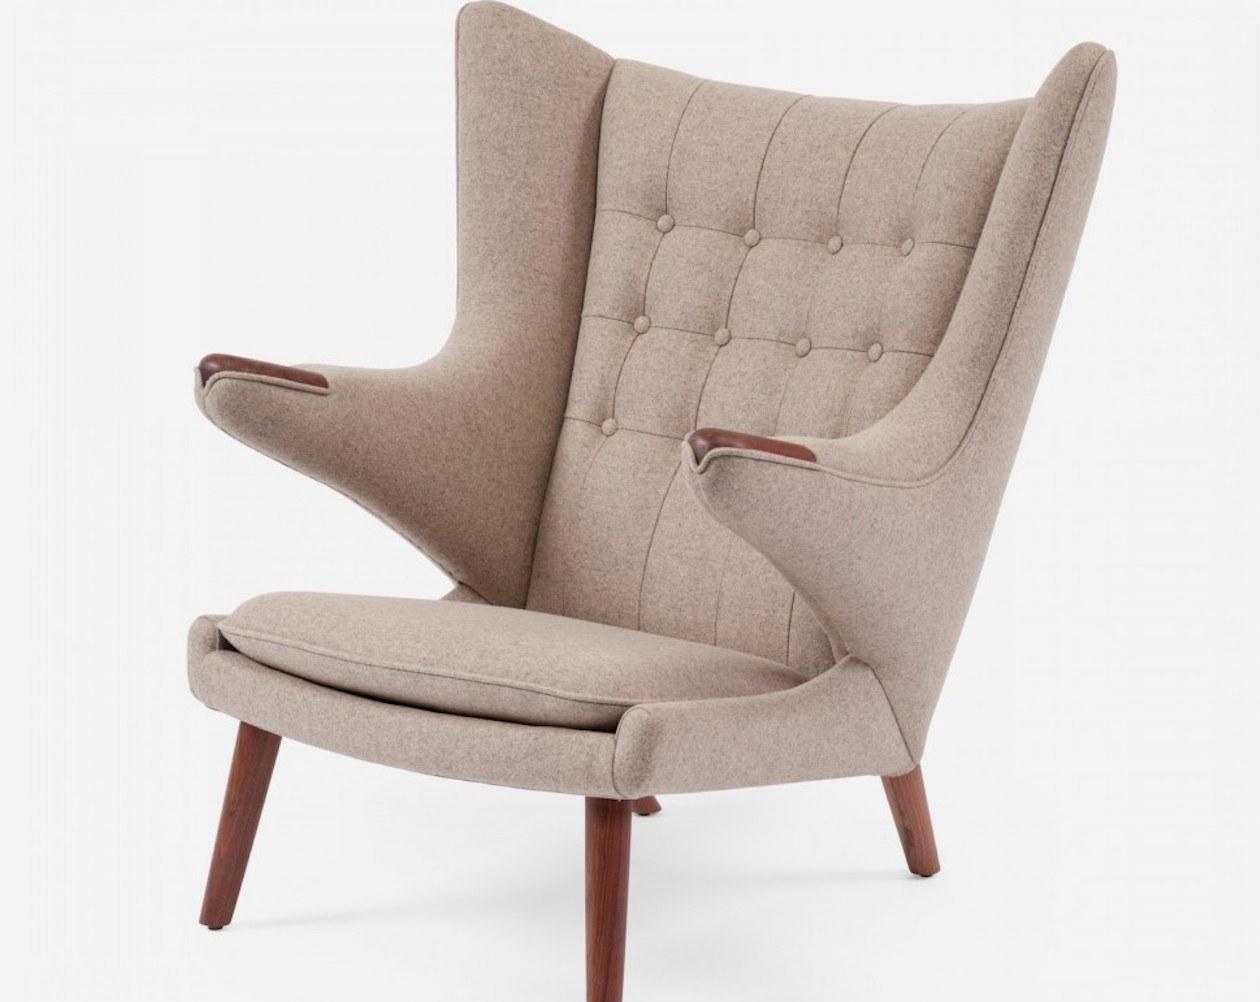 papa bear chair v rocker gaming australia modernica upholstered  gadget flow